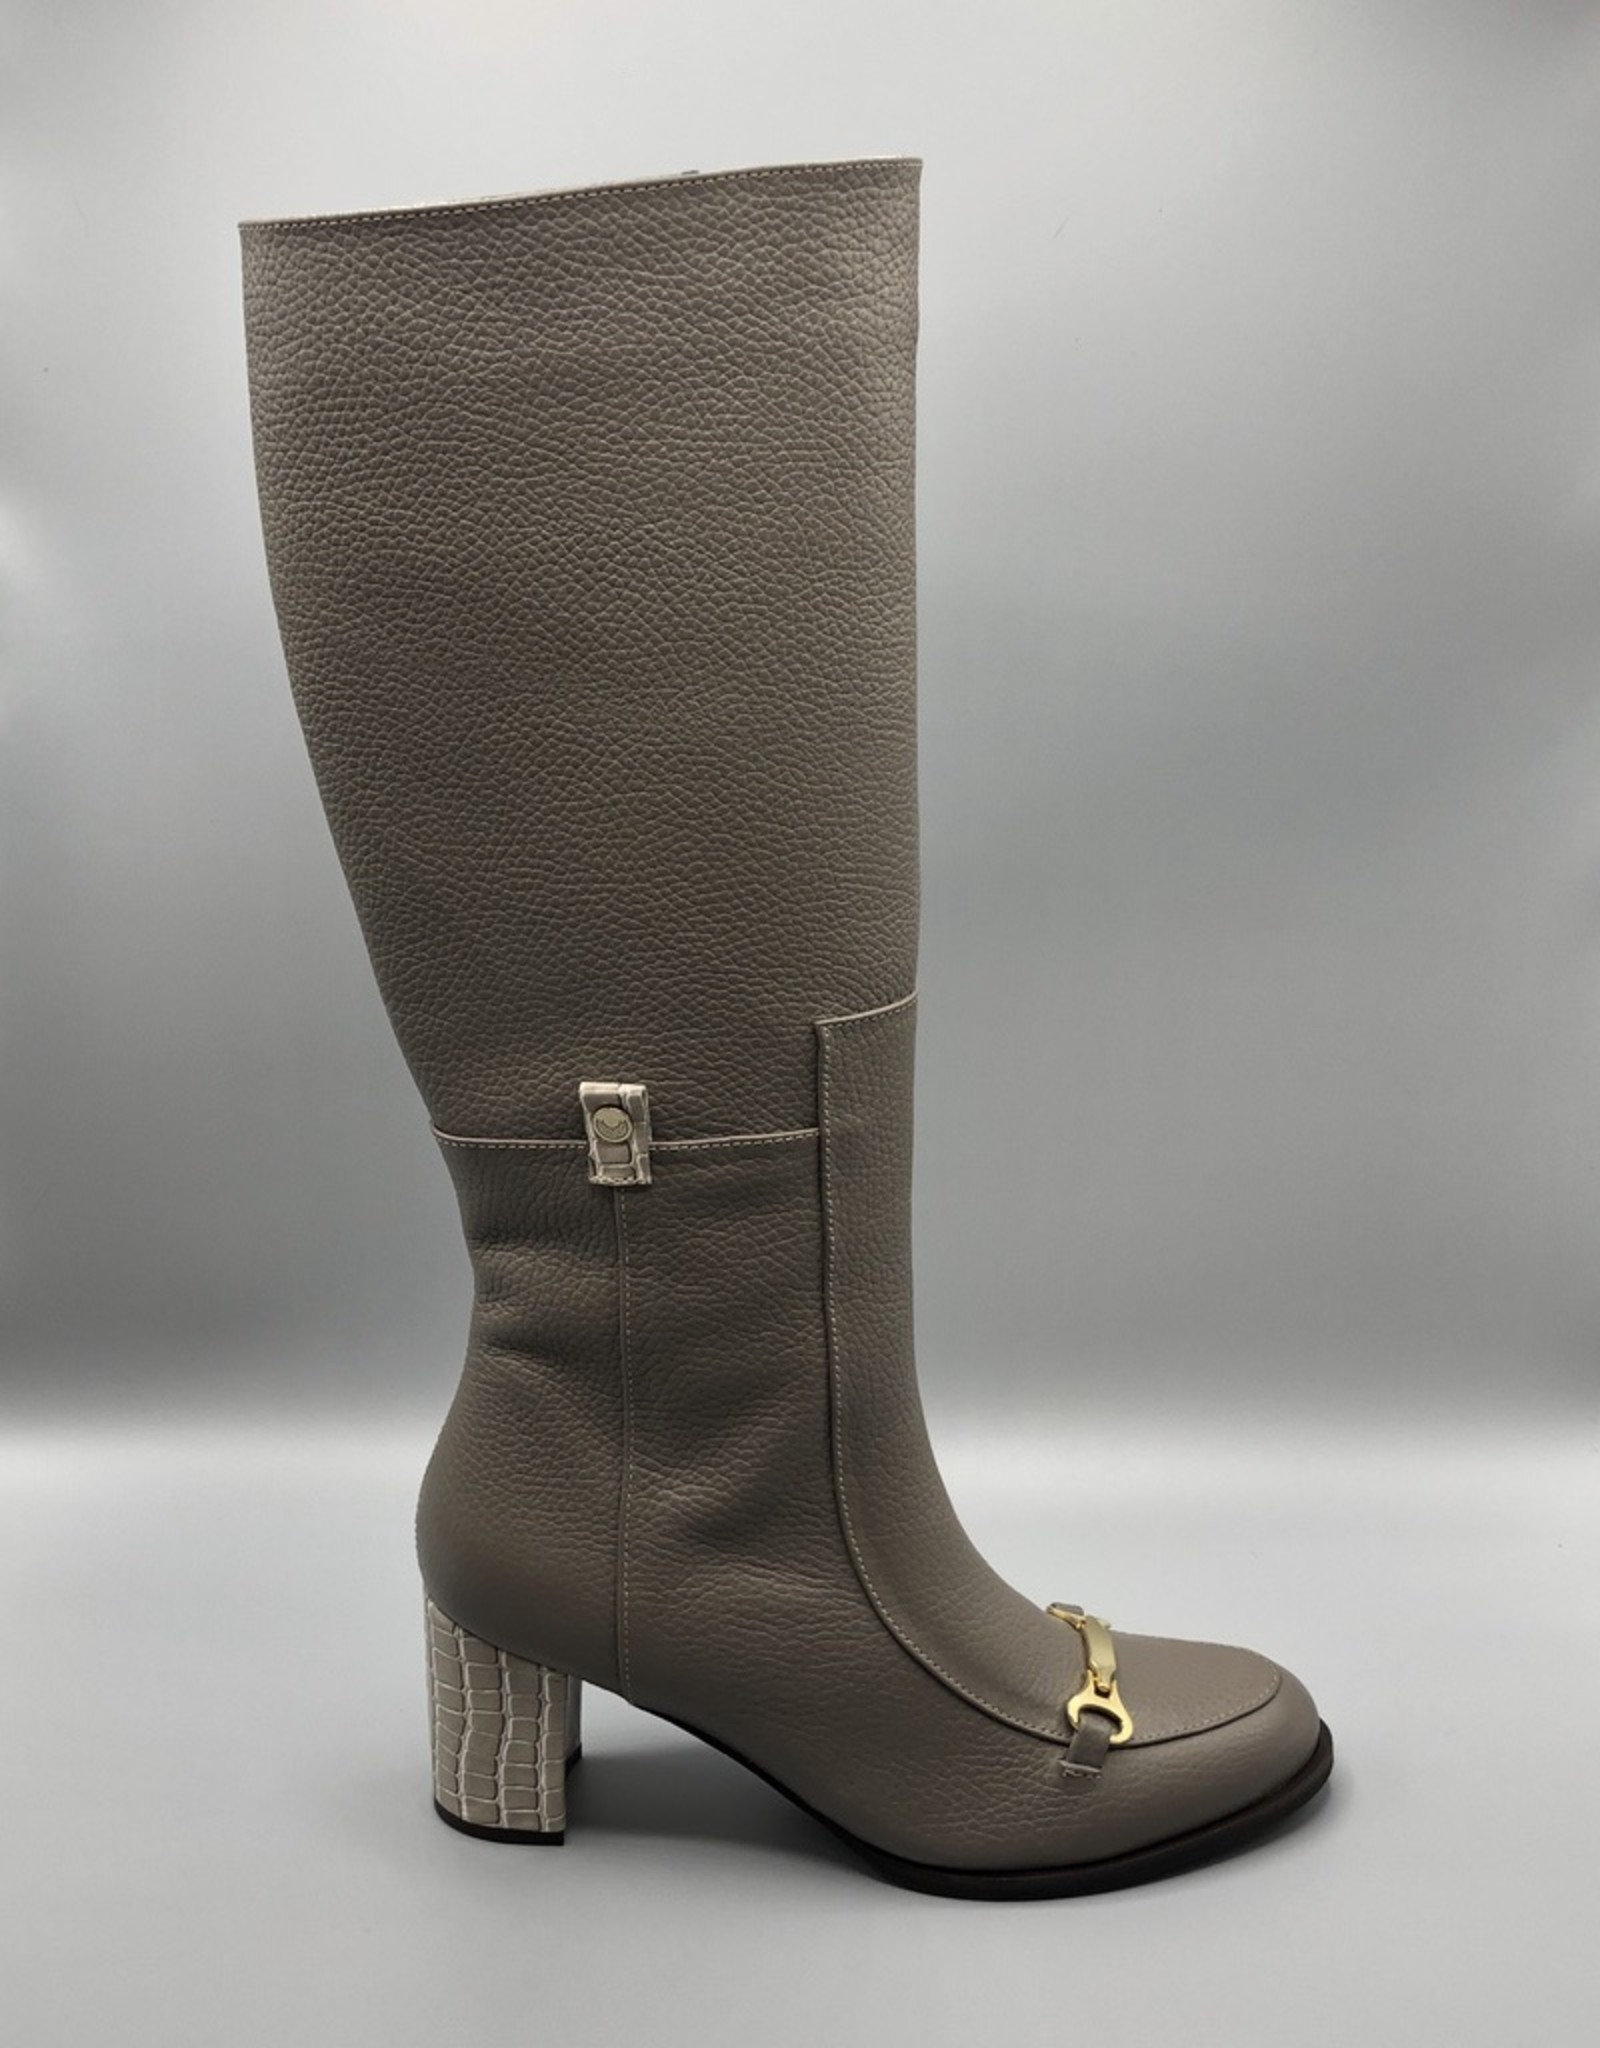 Stivali Stivali Seville Leather, Buckle Toe Knee Boot